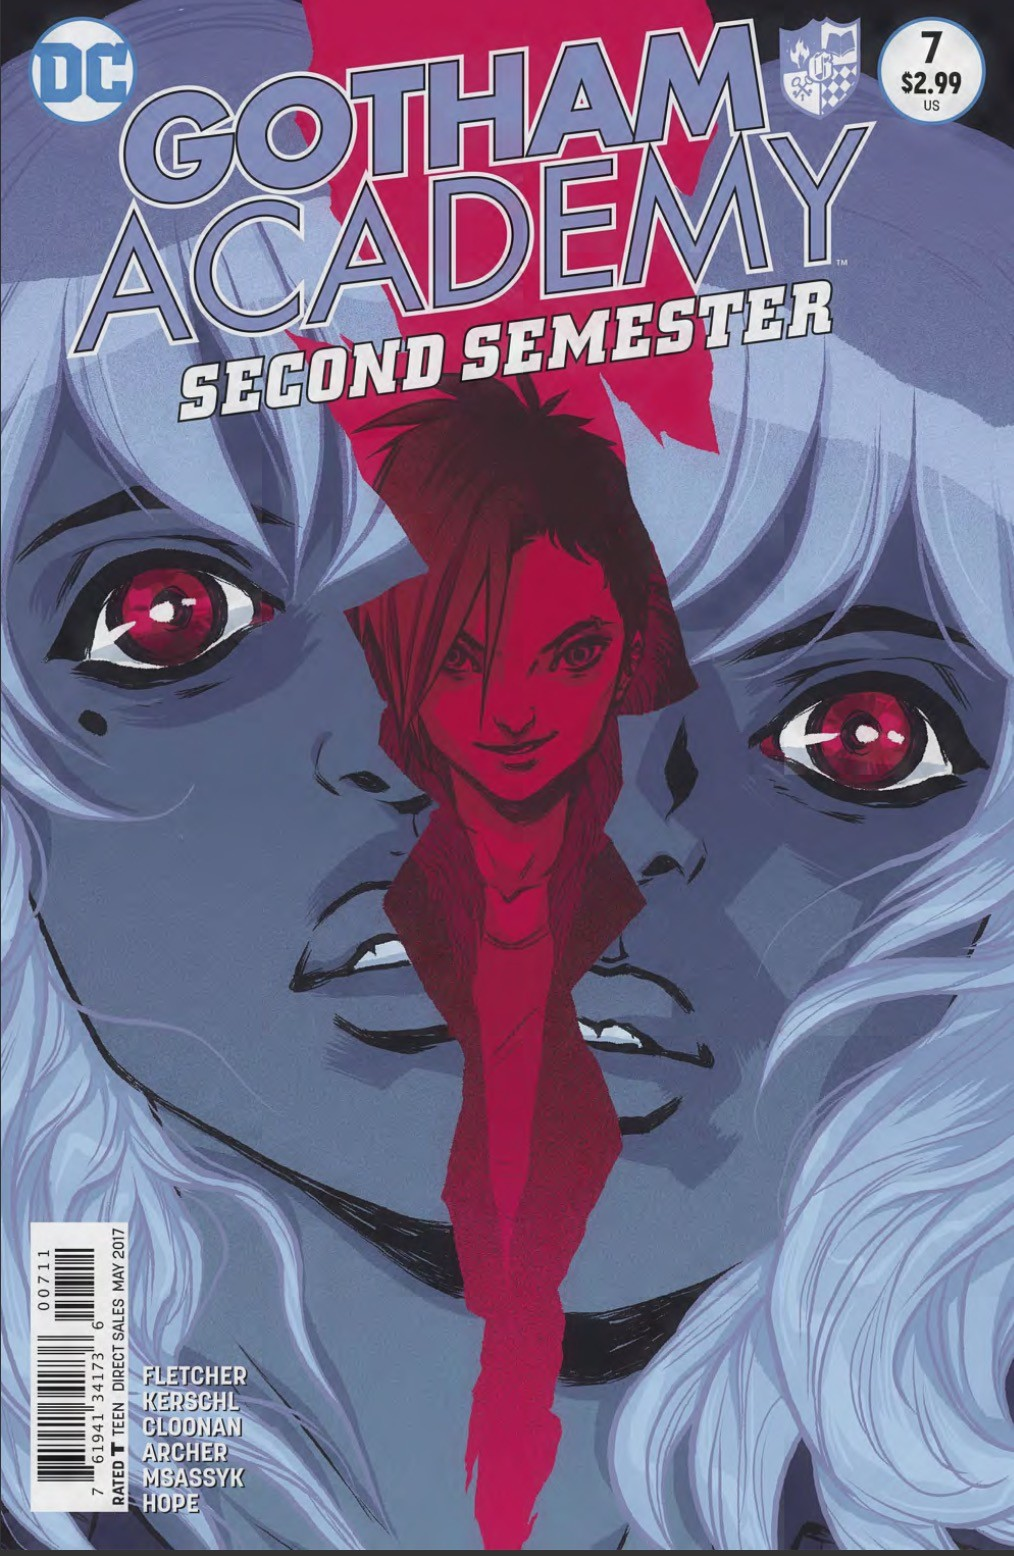 Gotham Academy Second Semester #7 Review